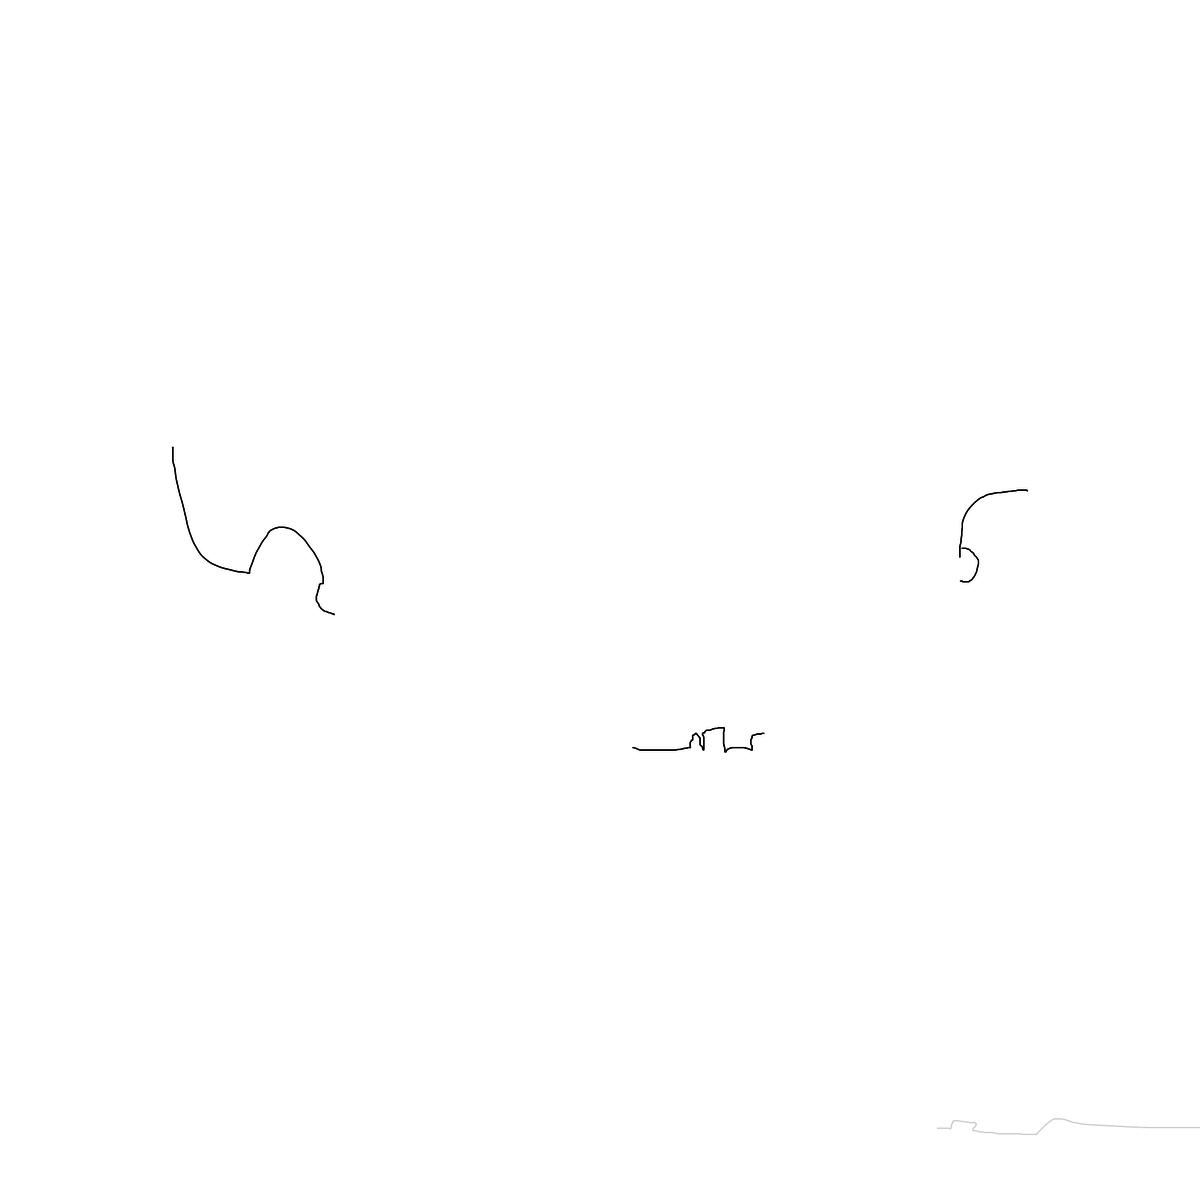 BAAAM drawing#22255 lat:78.4192581176757800lng: -4.4741191864013670